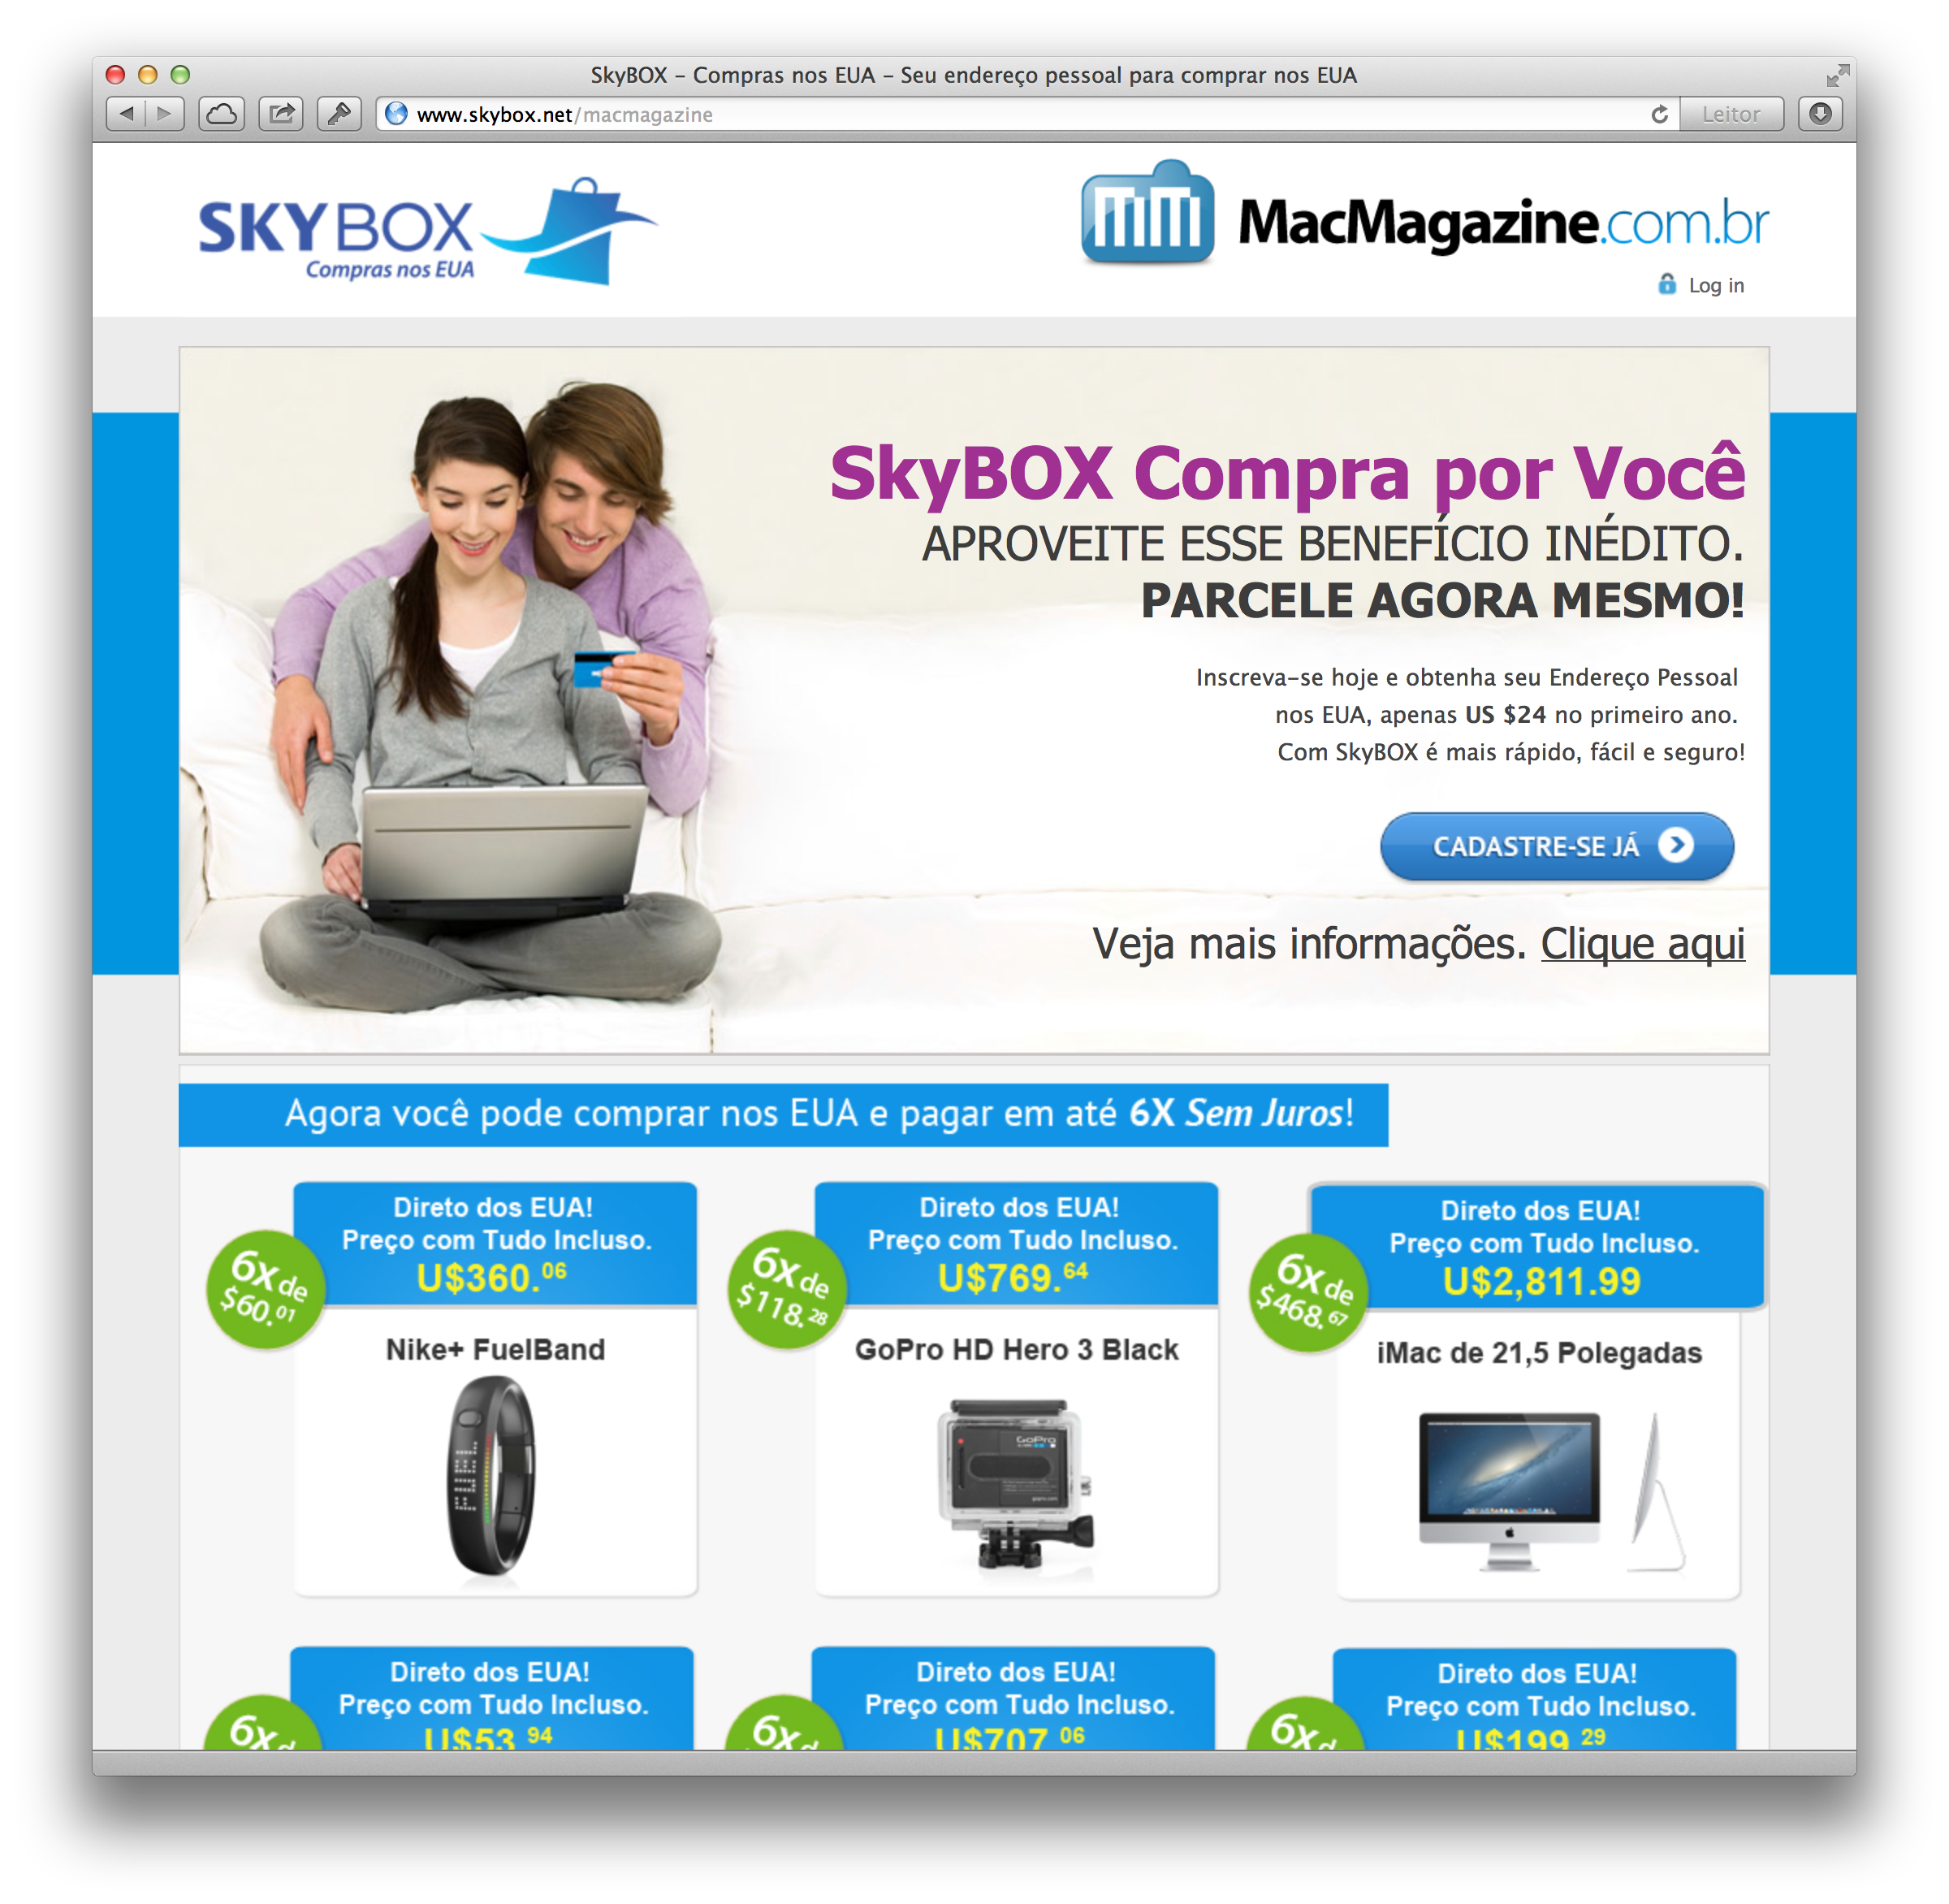 SkyBOX - MacMagazine